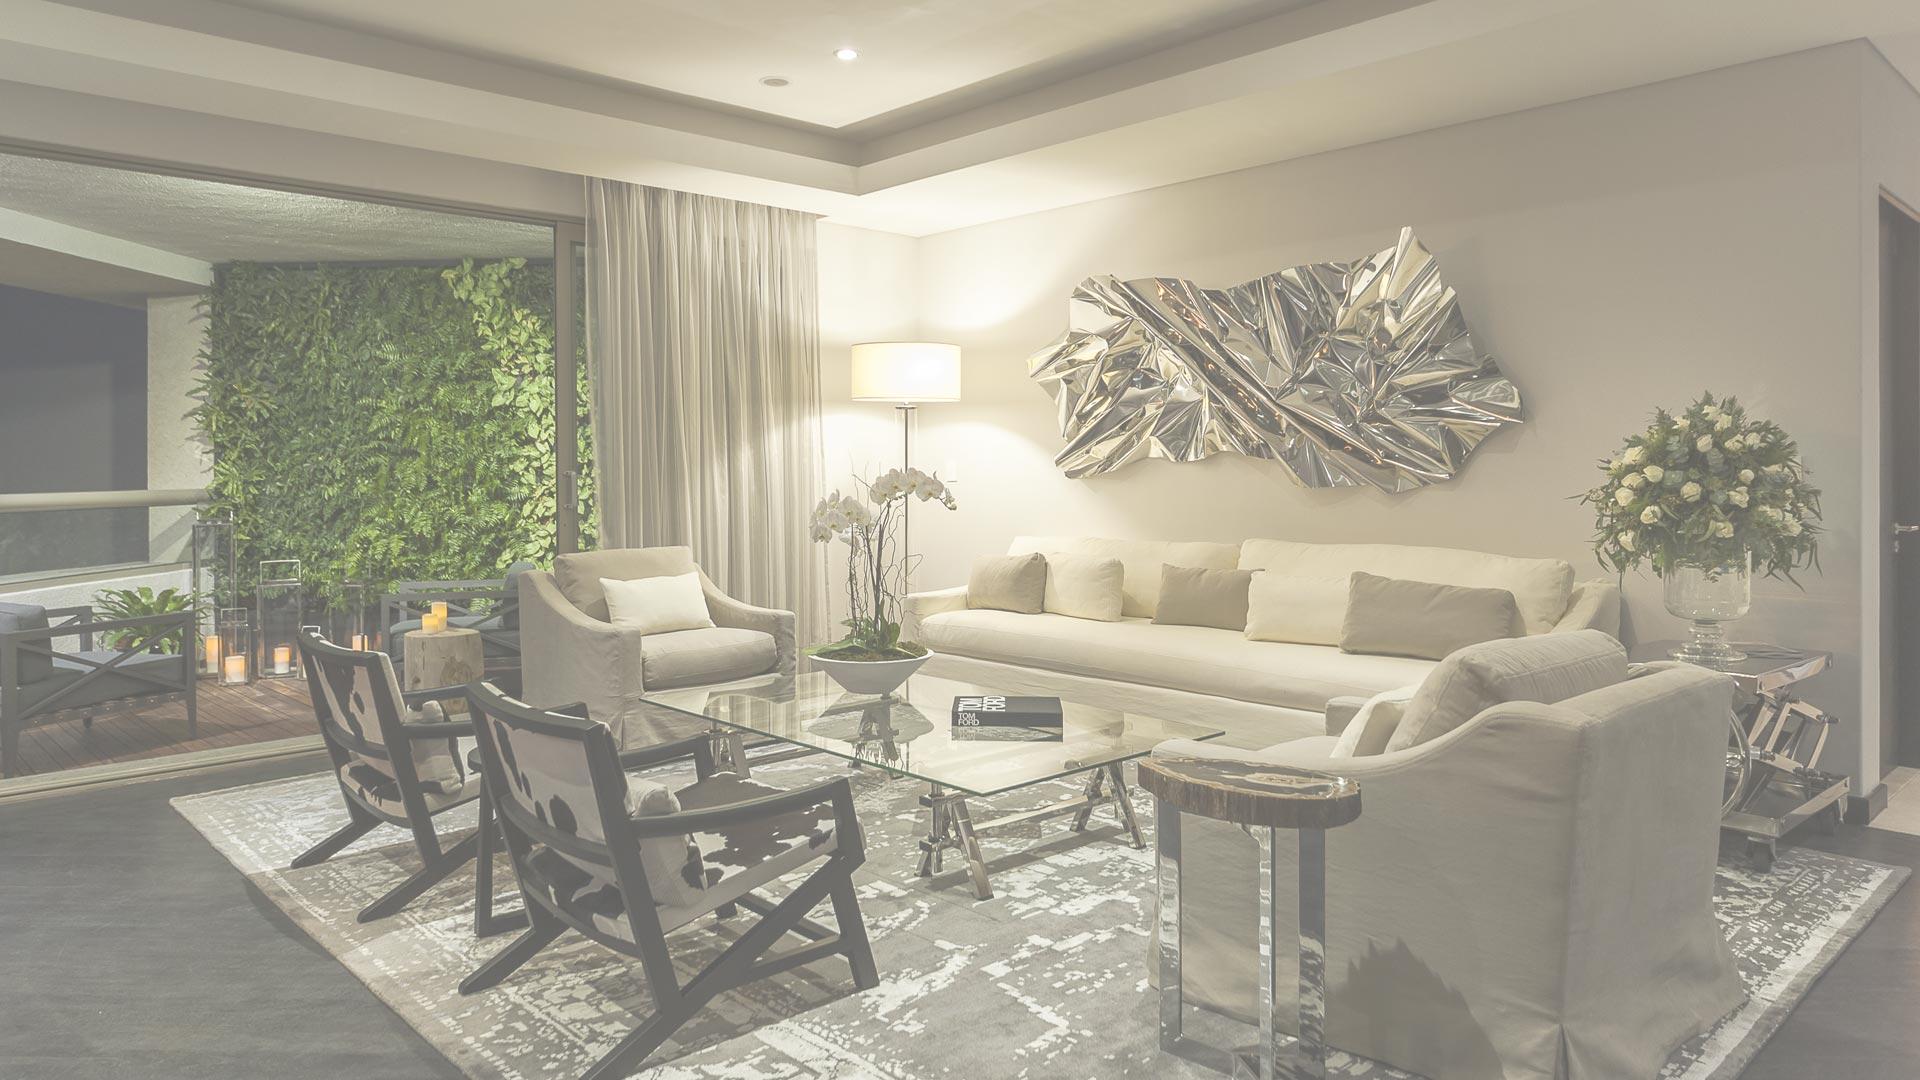 Ho arquitectura de interiores for Arquitectura de interiores